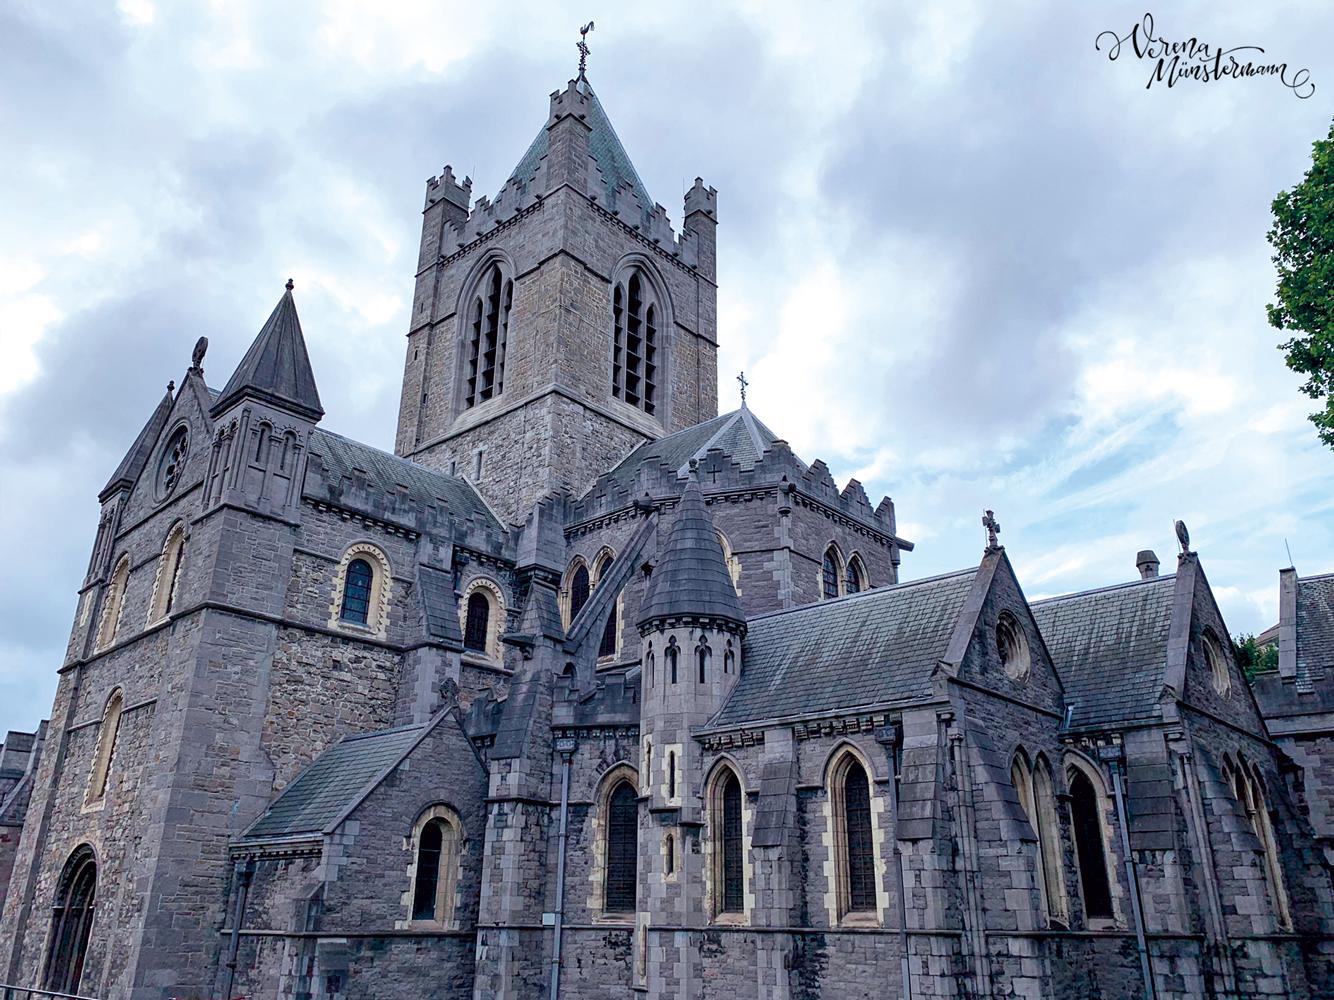 Dublin - Städtetrip - Christ Church Cathedral- verenamuenstermann.de